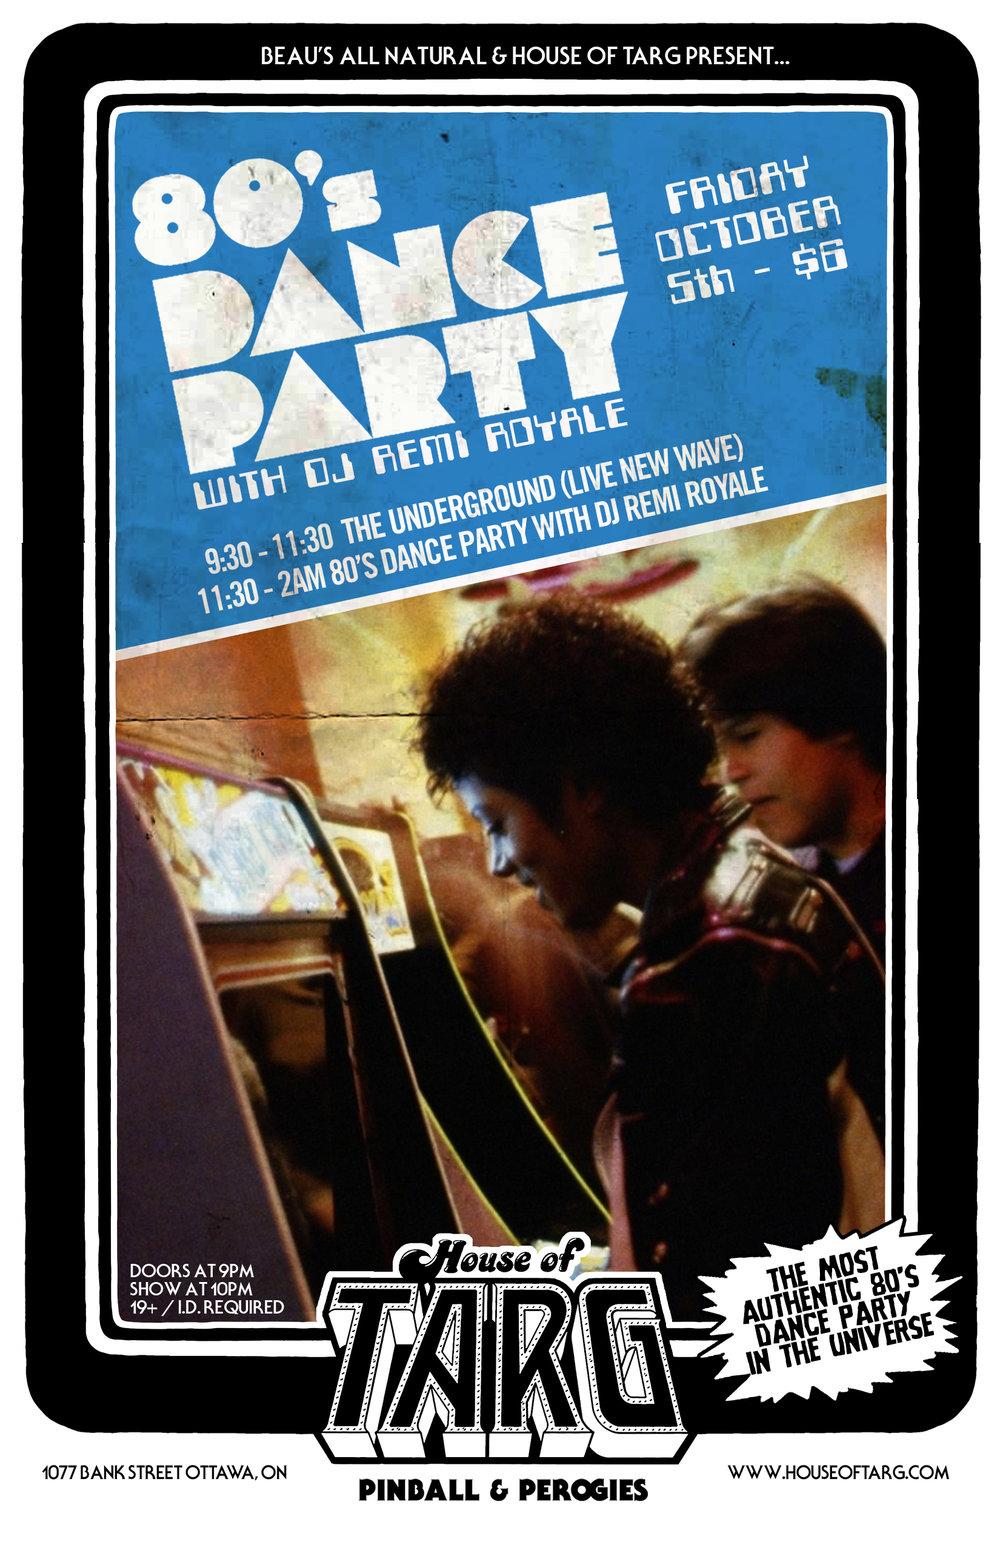 80s dance party Fri Oct 5.jpg